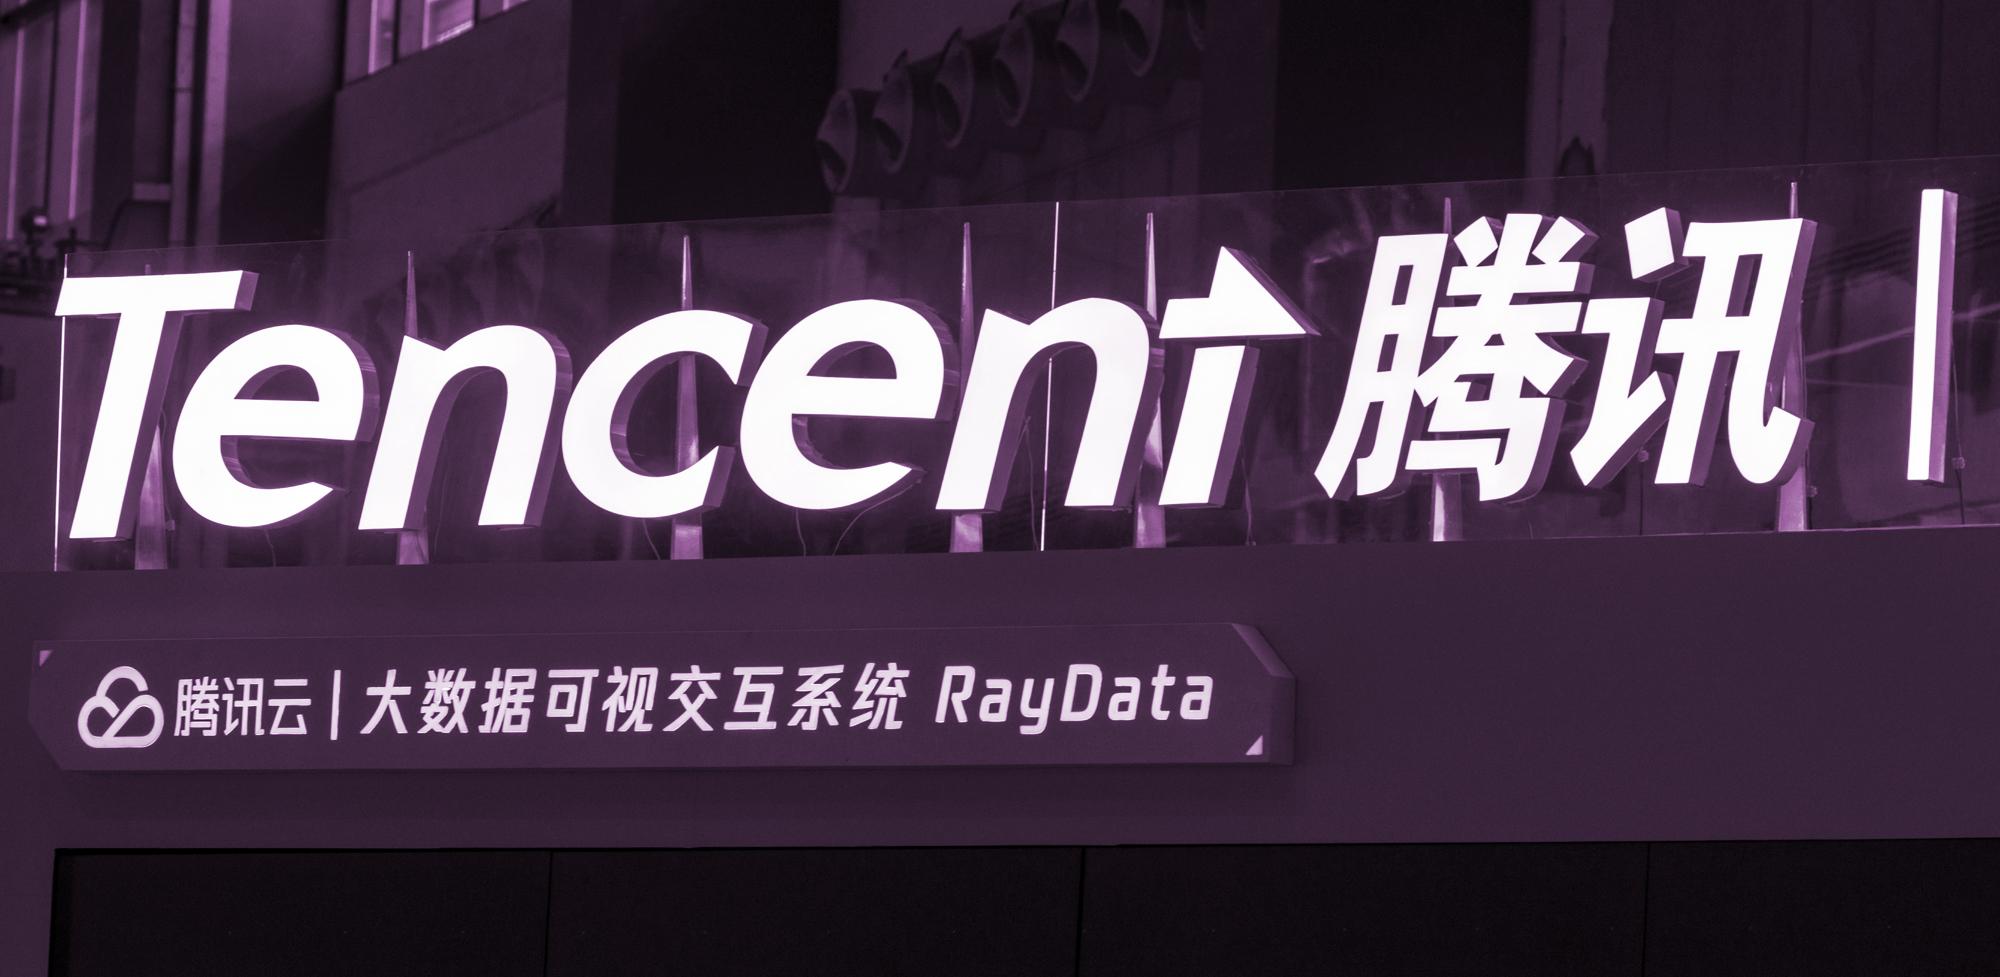 Business Maverick: Tencent Should BeSplit Up